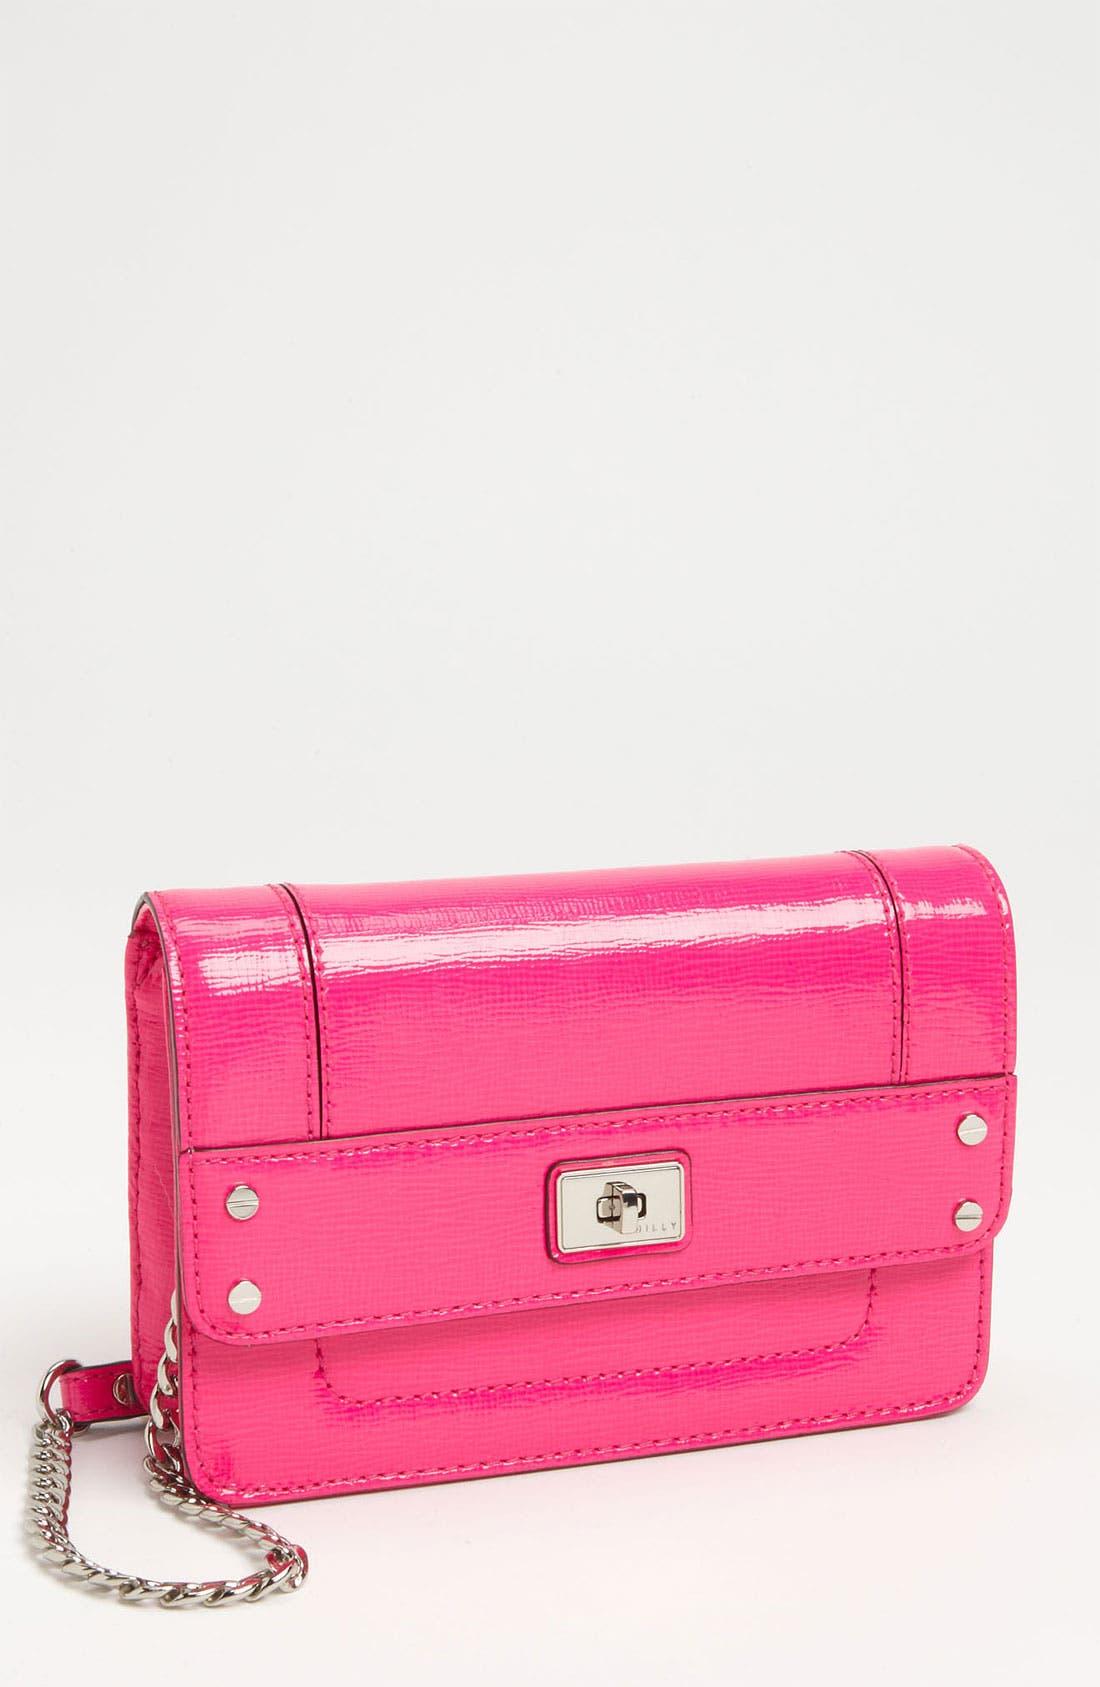 Alternate Image 1 Selected - Milly 'Colette' Crossbody Bag